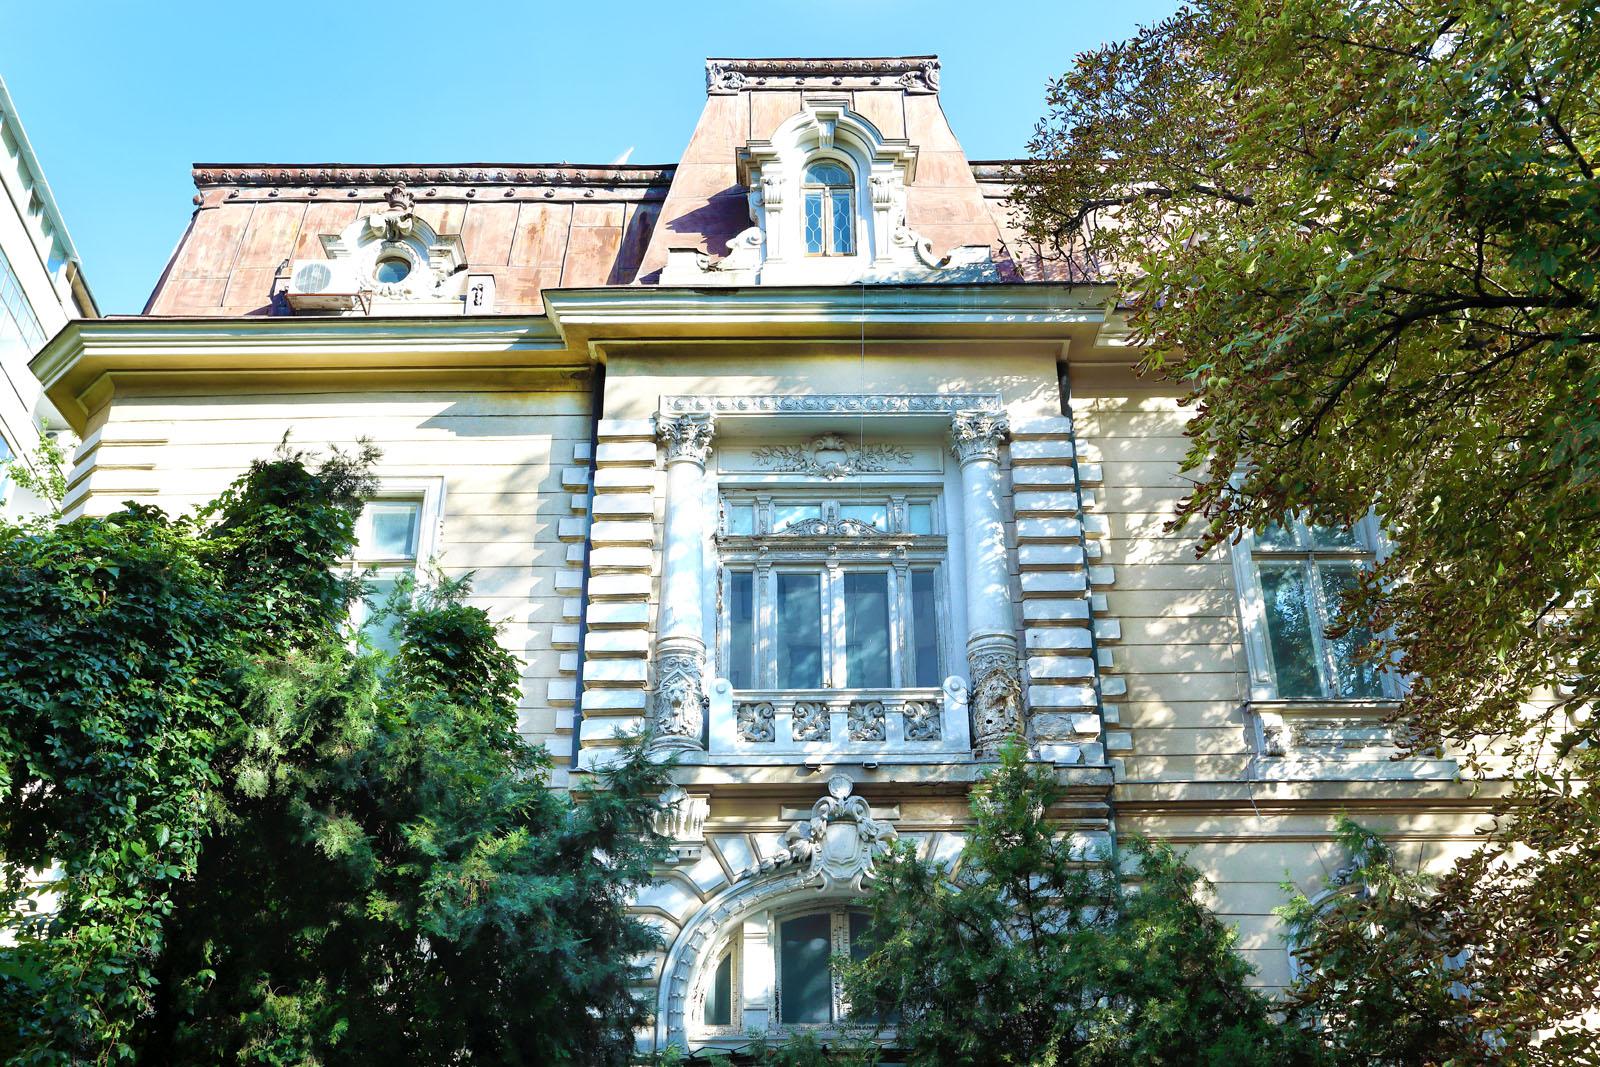 https://www.sothebysrealty.ro/wp/wp-content/uploads/2019/11/Vila-Athanasovici-Batistei-Bucuresti_Artmark-Historical-Estate-Exterior.jpg